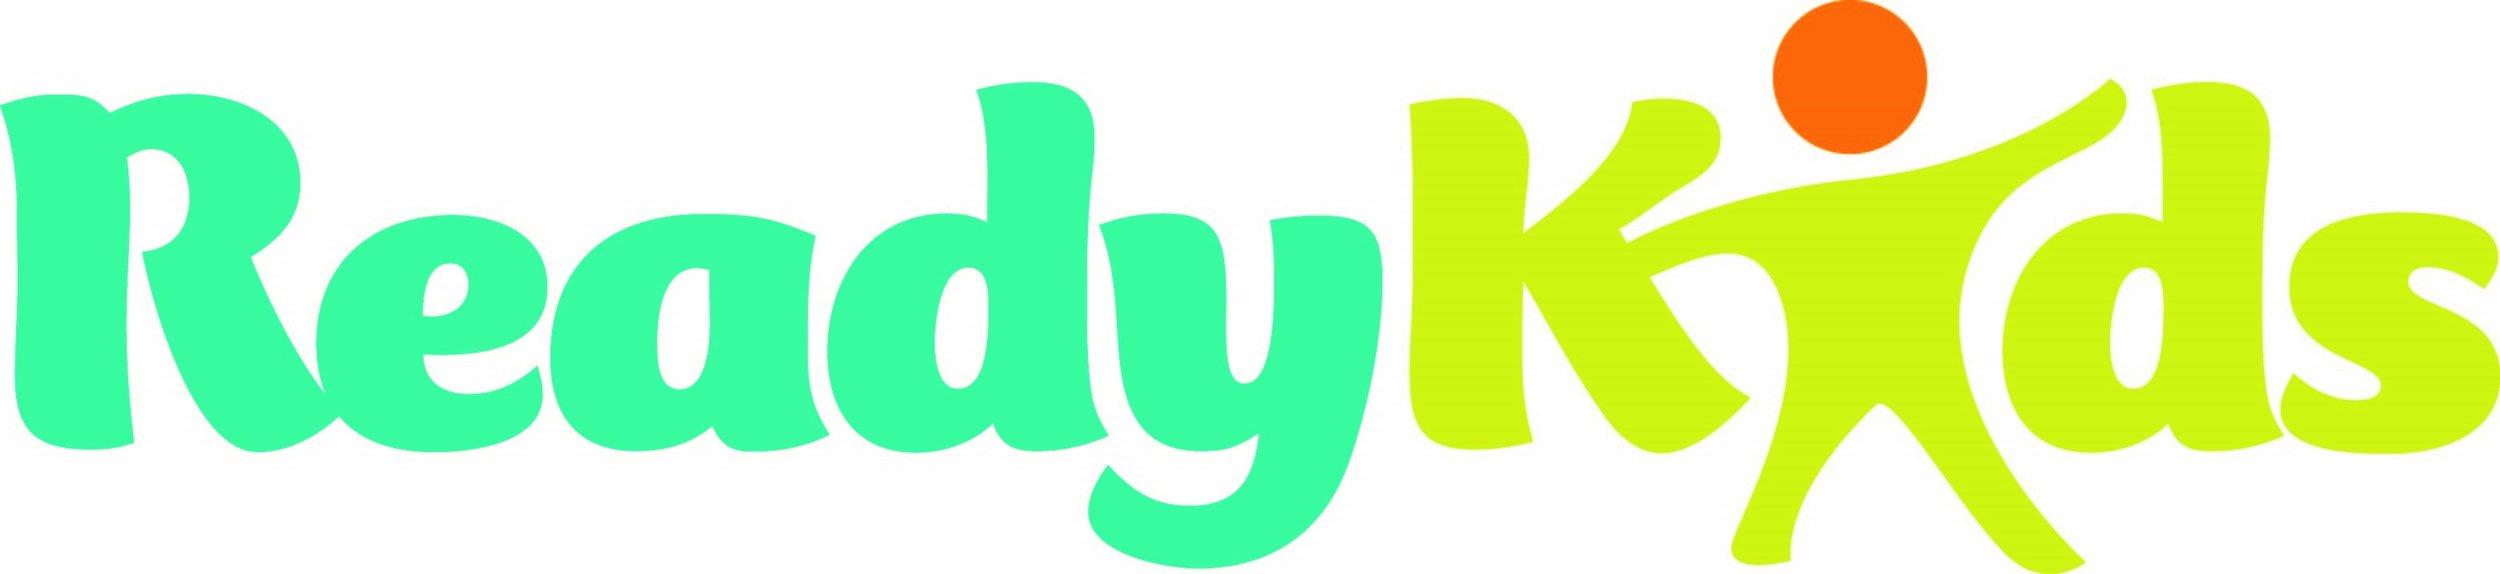 ReadyKids Logo.jpg